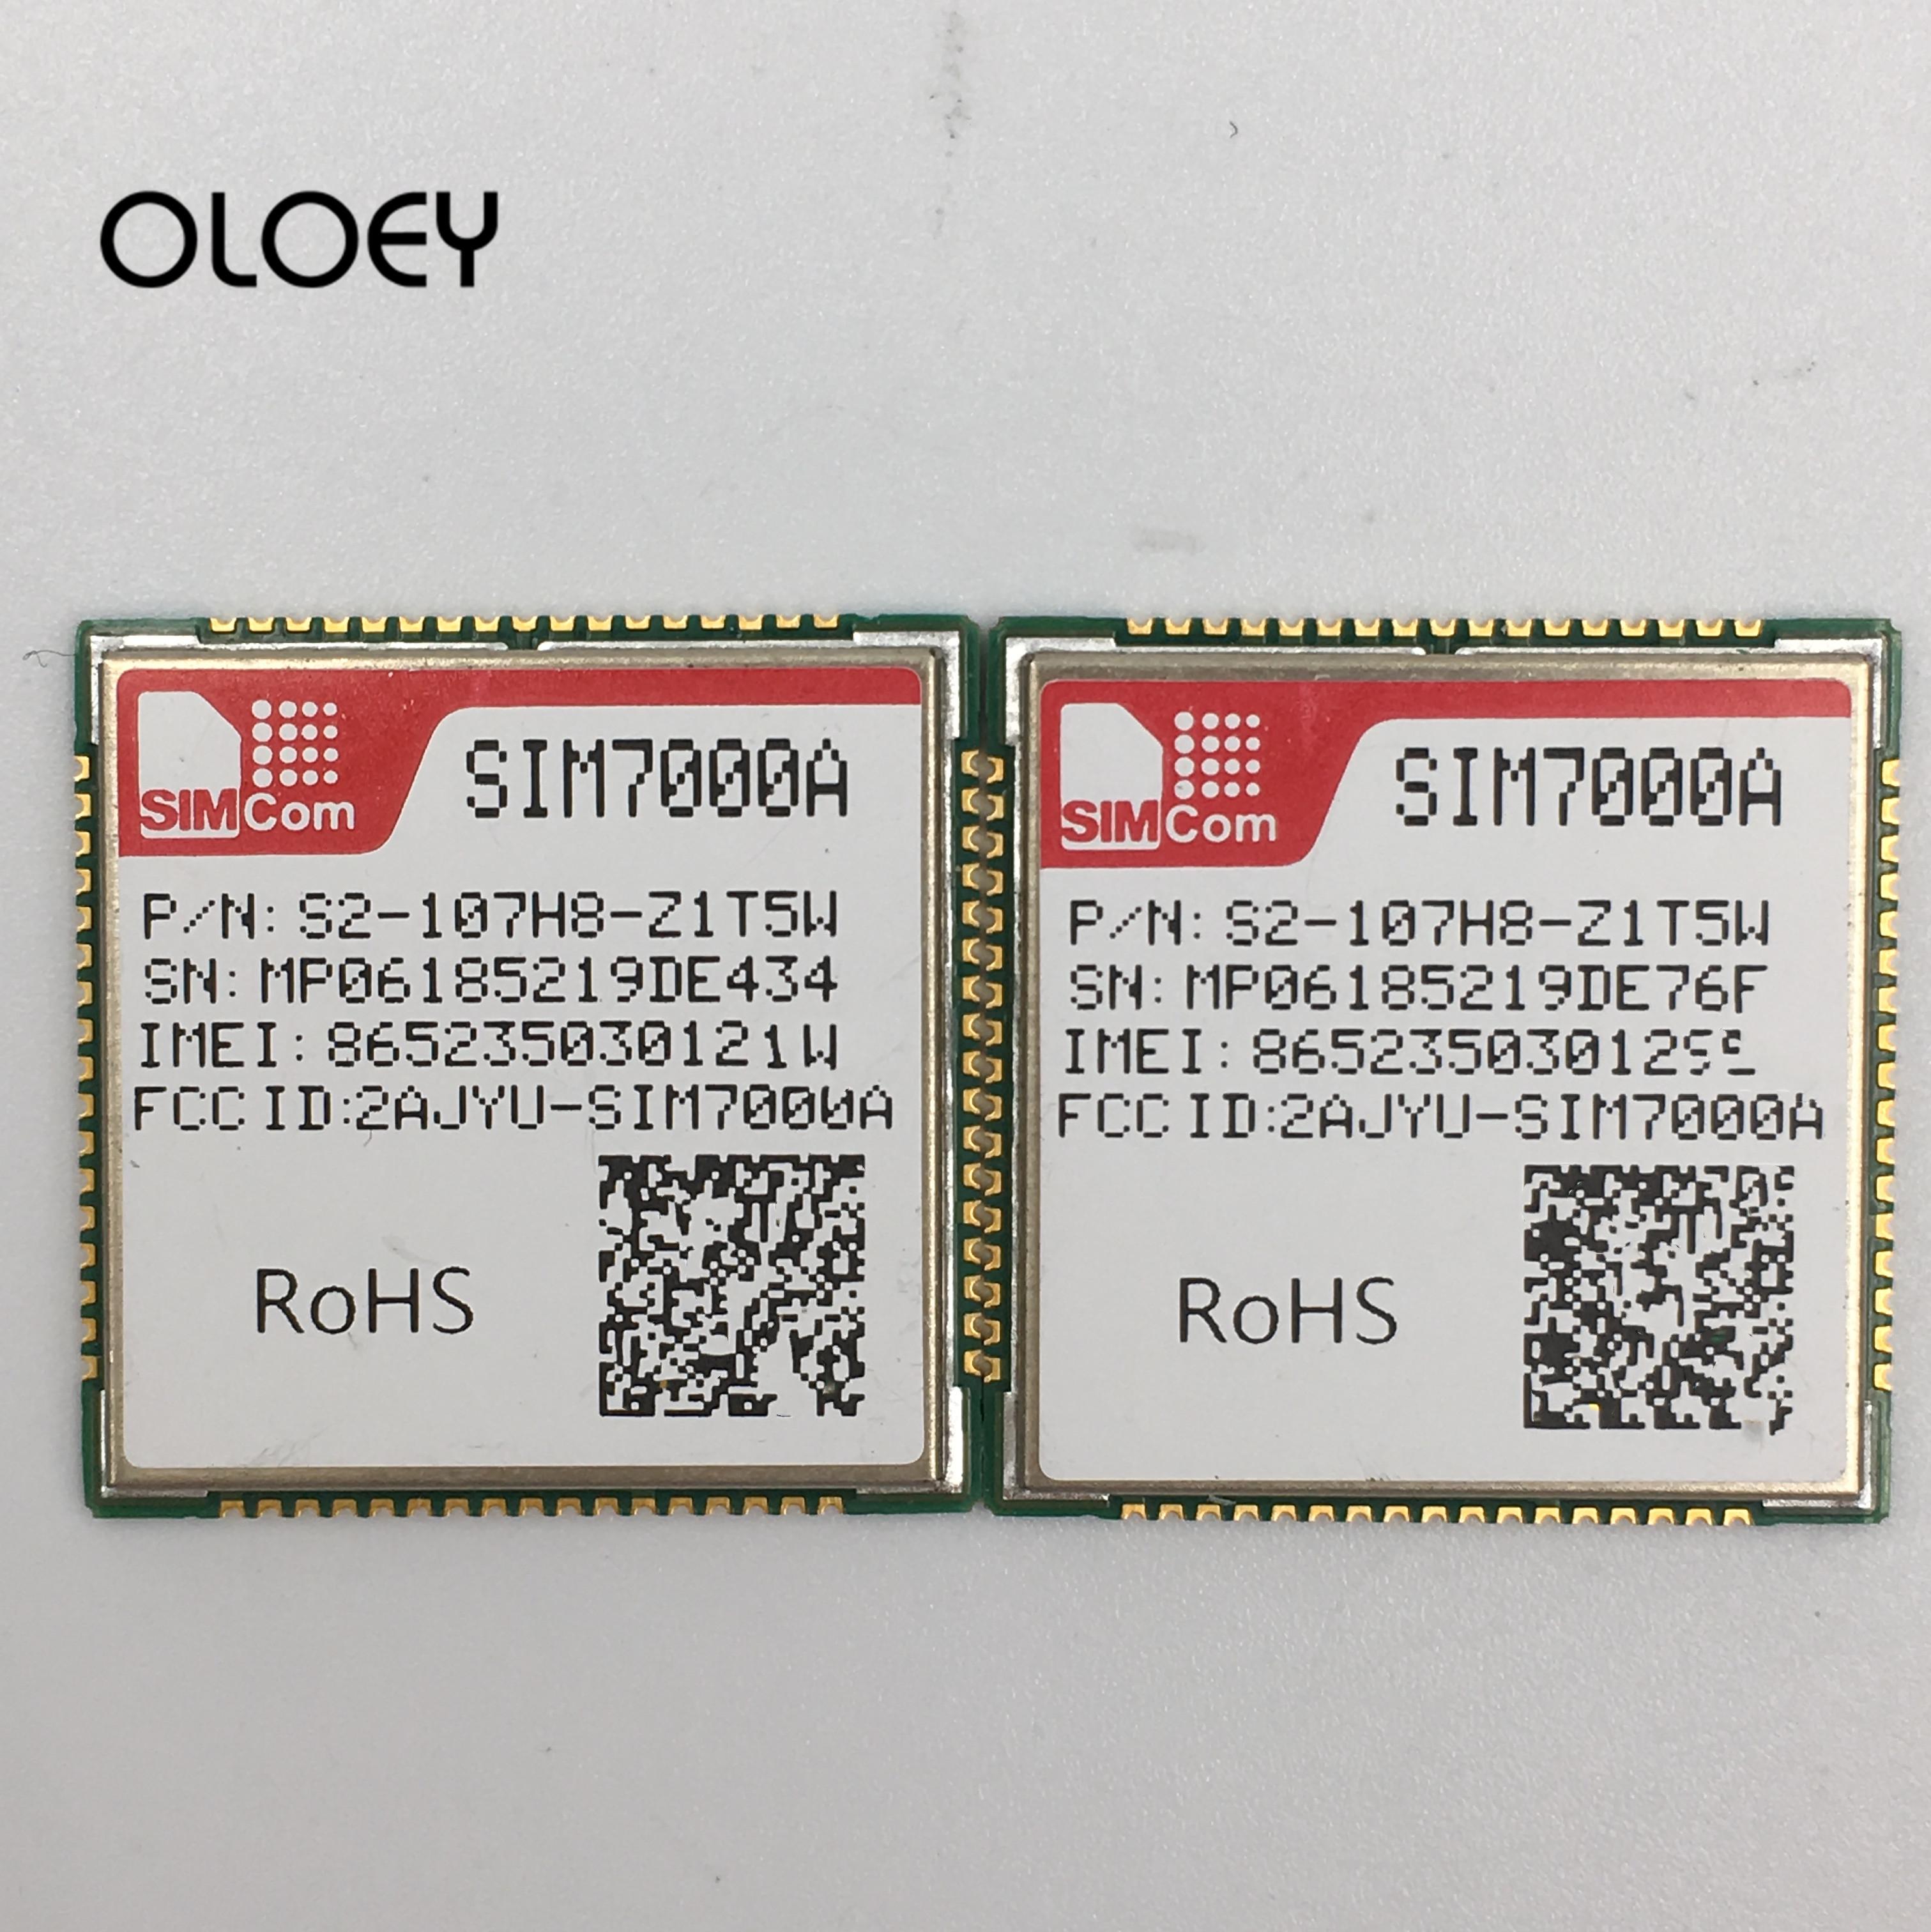 SIMCom SIM7000A LCC  Cat-M1 Module EMTC NB-IoT, B2 B4 B12 B13,100% Brand New Original